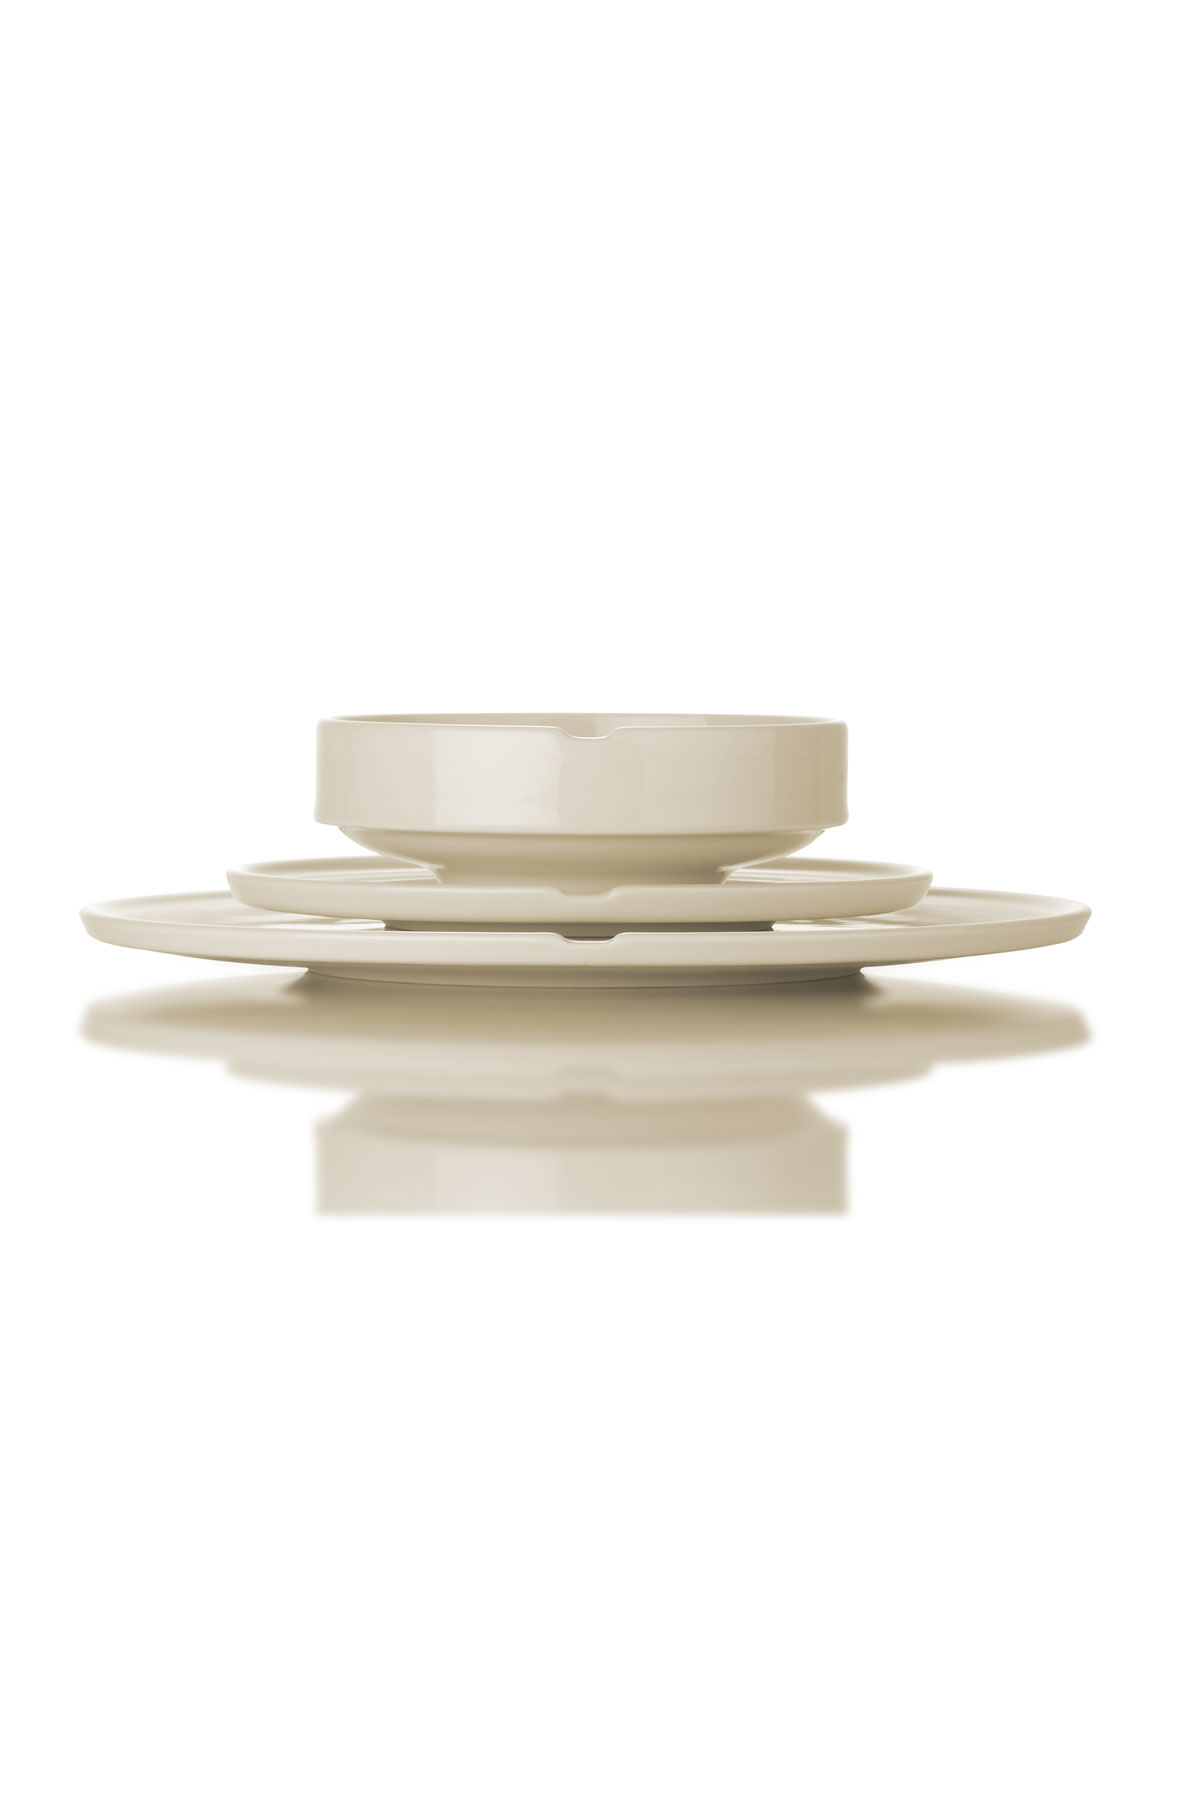 Kütahya Porselen Chef Taste Of 24 cm Spagetti Tabağı Krem